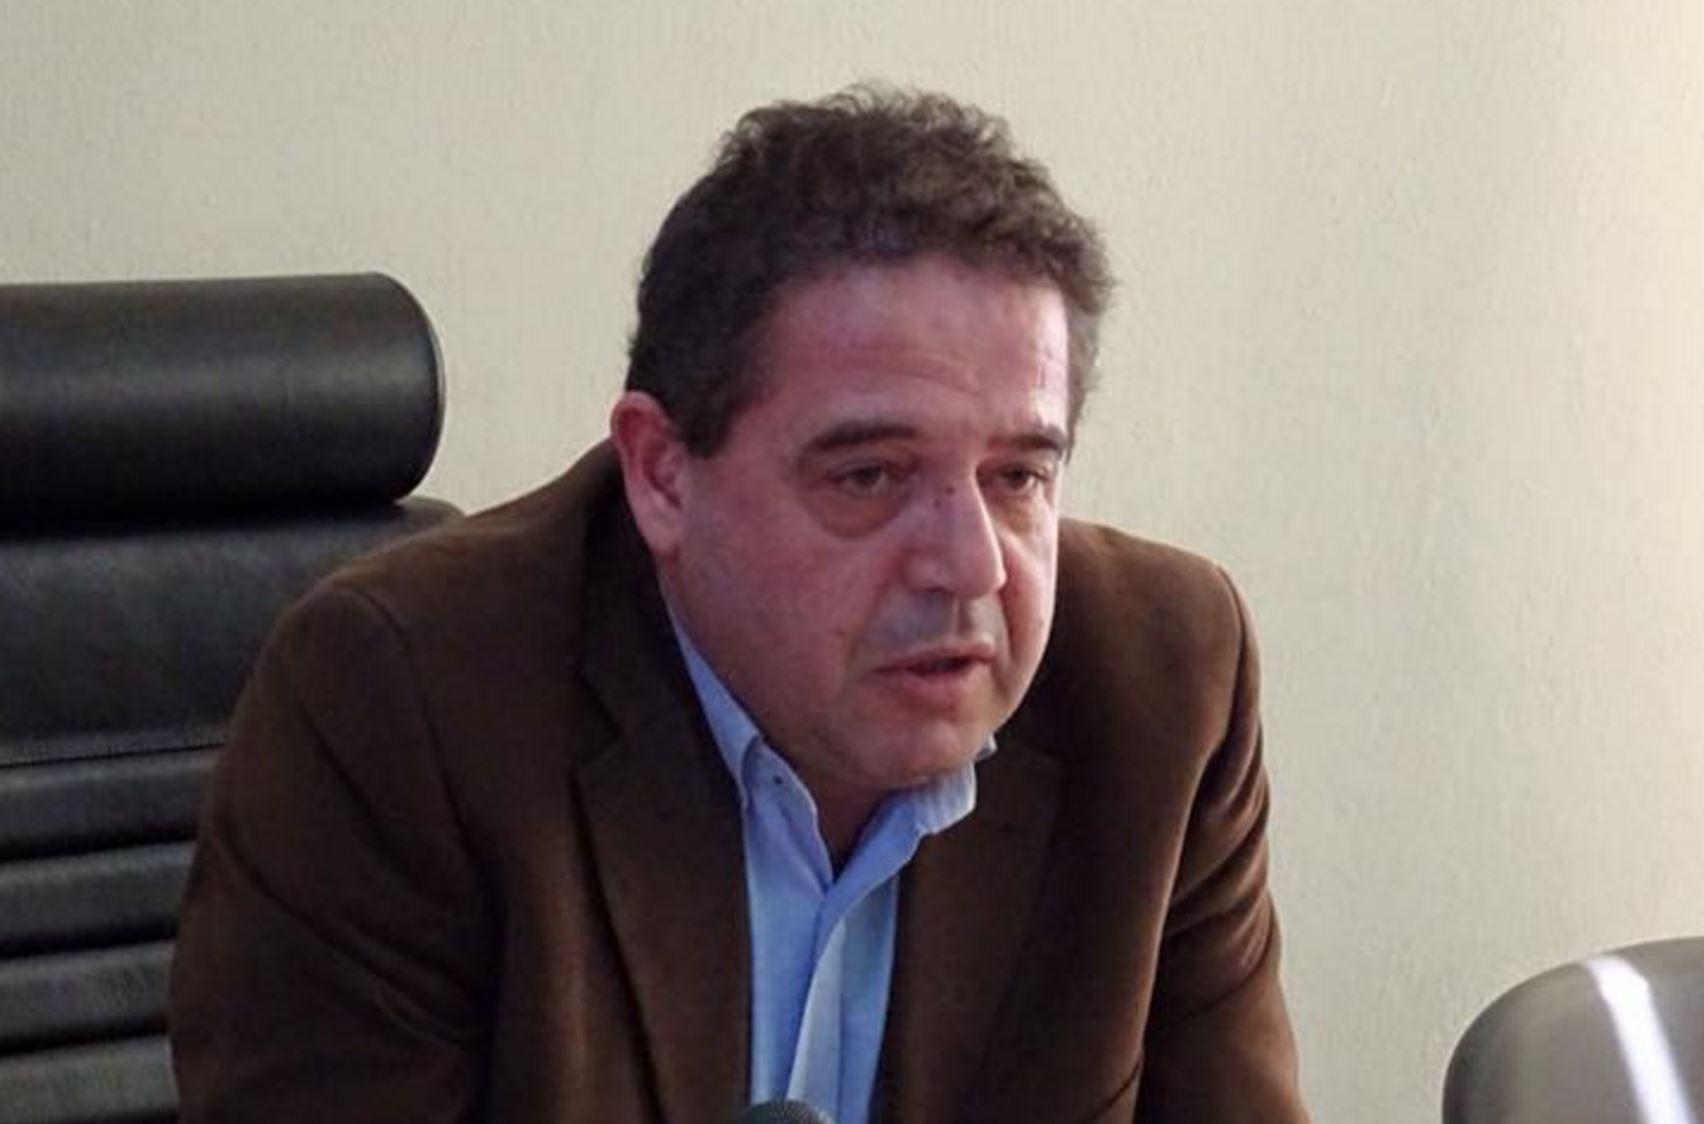 Tα κύρια σημεία συνέντευξης απολογισμού Σταύρου Γιαννακίδη (Δελτίο τύπου)